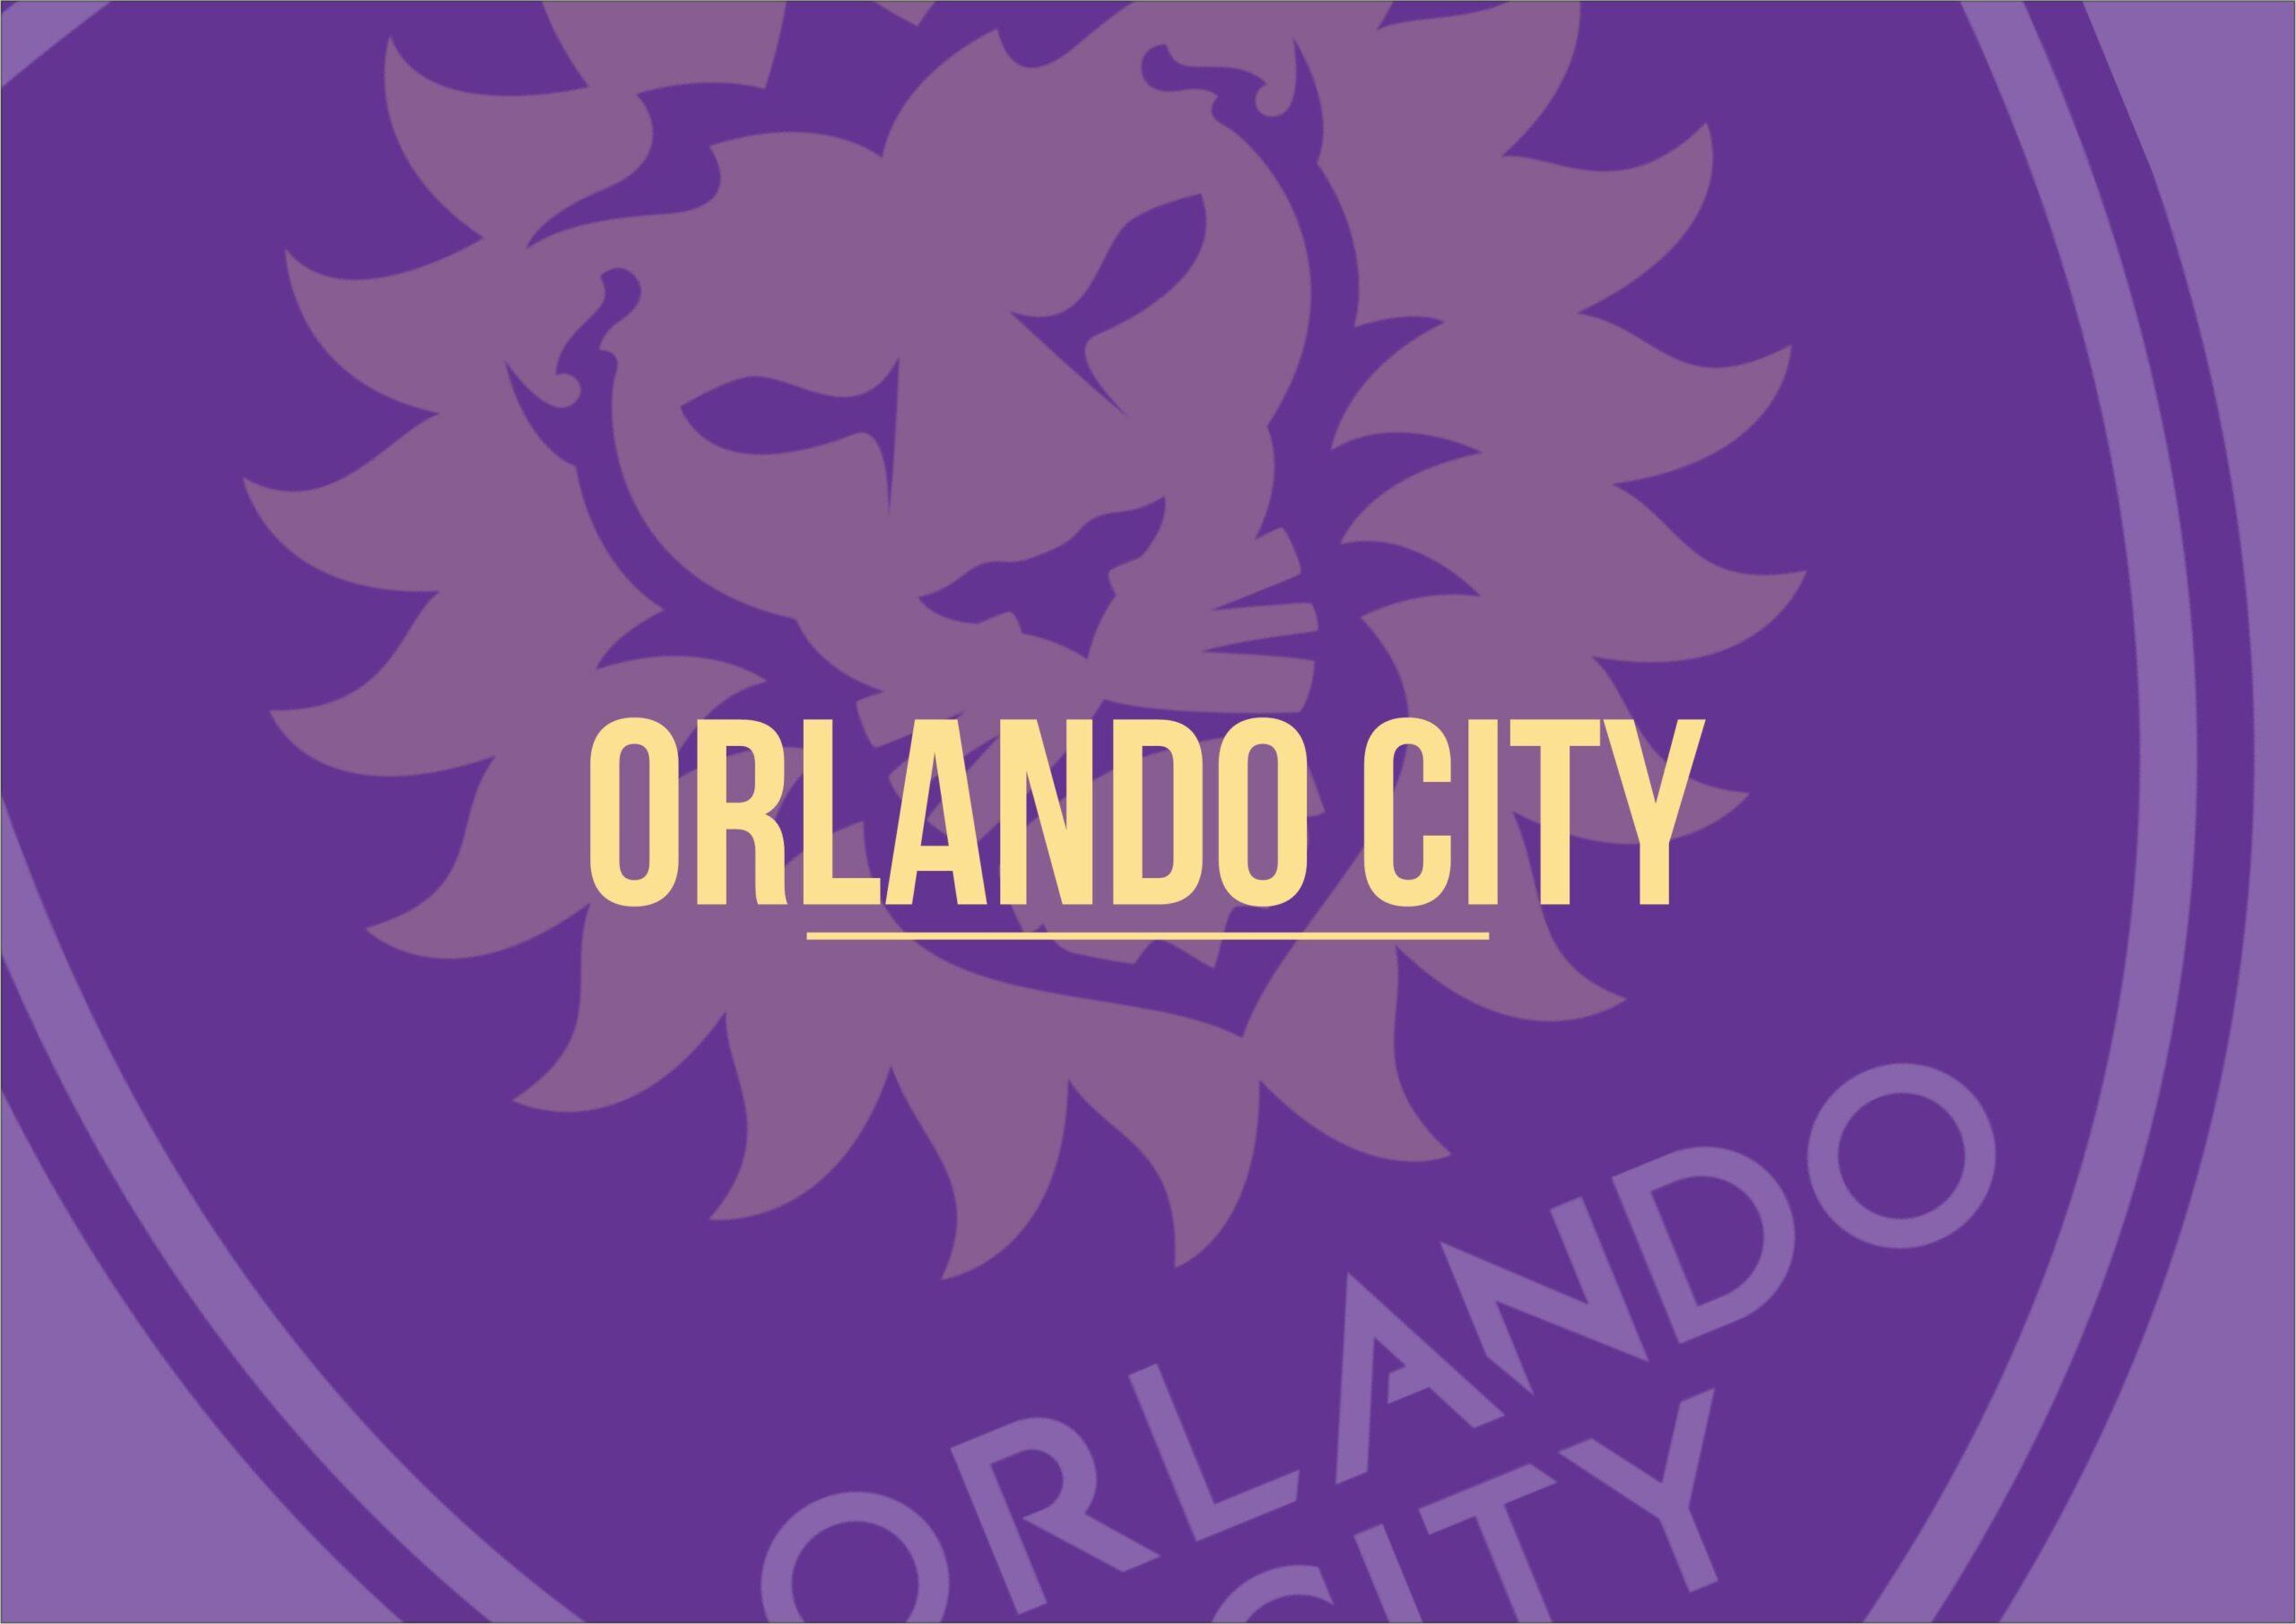 Orlando City | MLS Magazine Italia